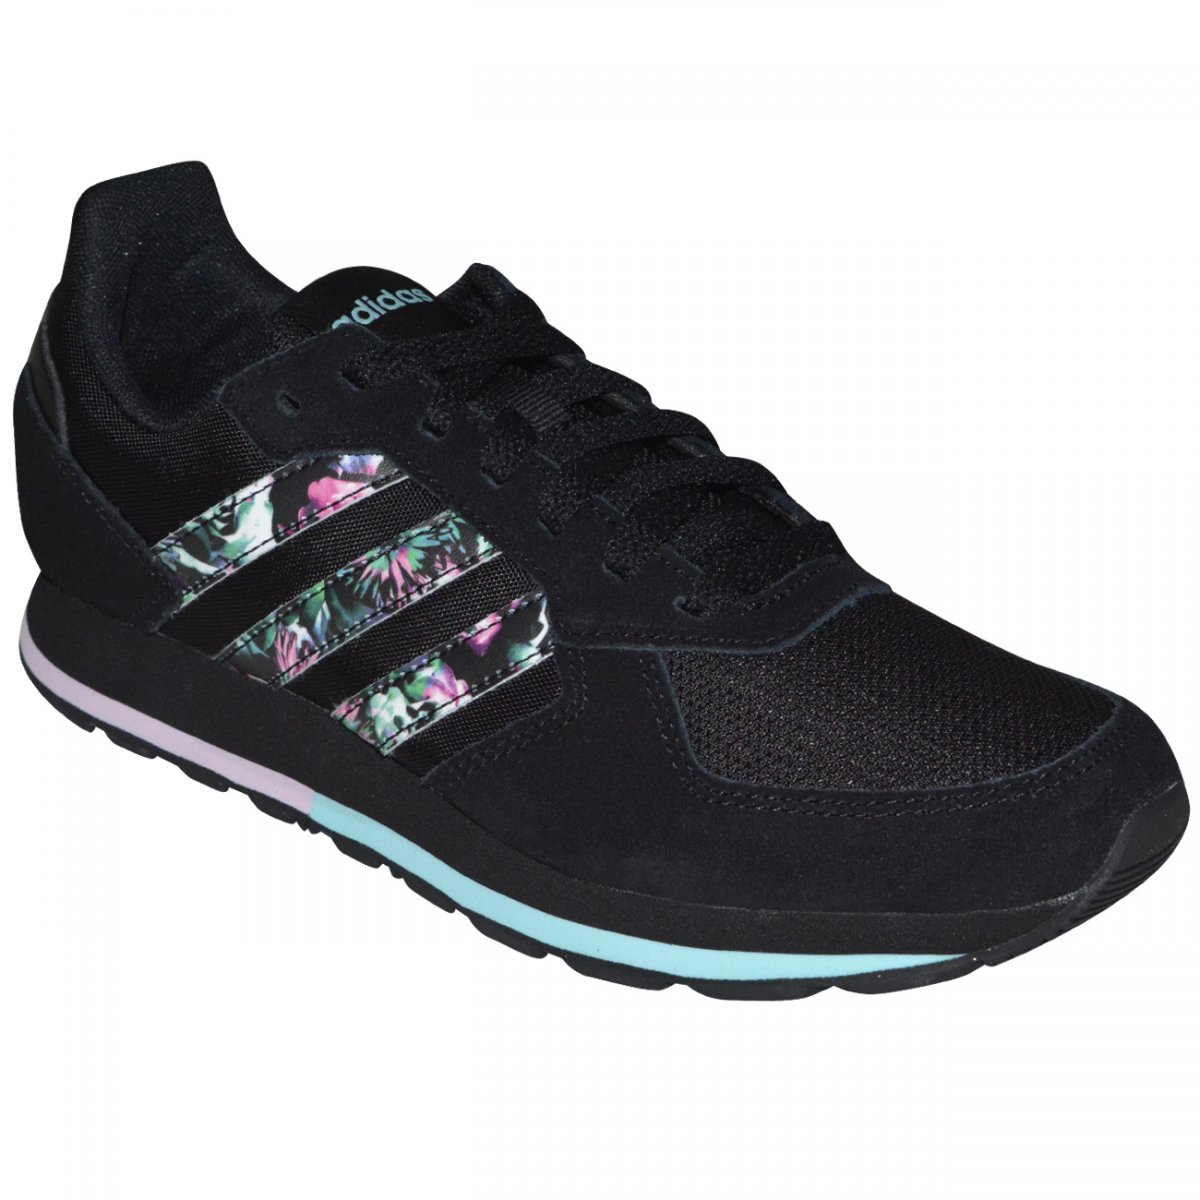 1ff4f5fc68 Tenis Adidas 8K DB1815 - Preto/floral - Chuteira Nike, Adidas. Sandalias  Femininas. Sandy Calçados